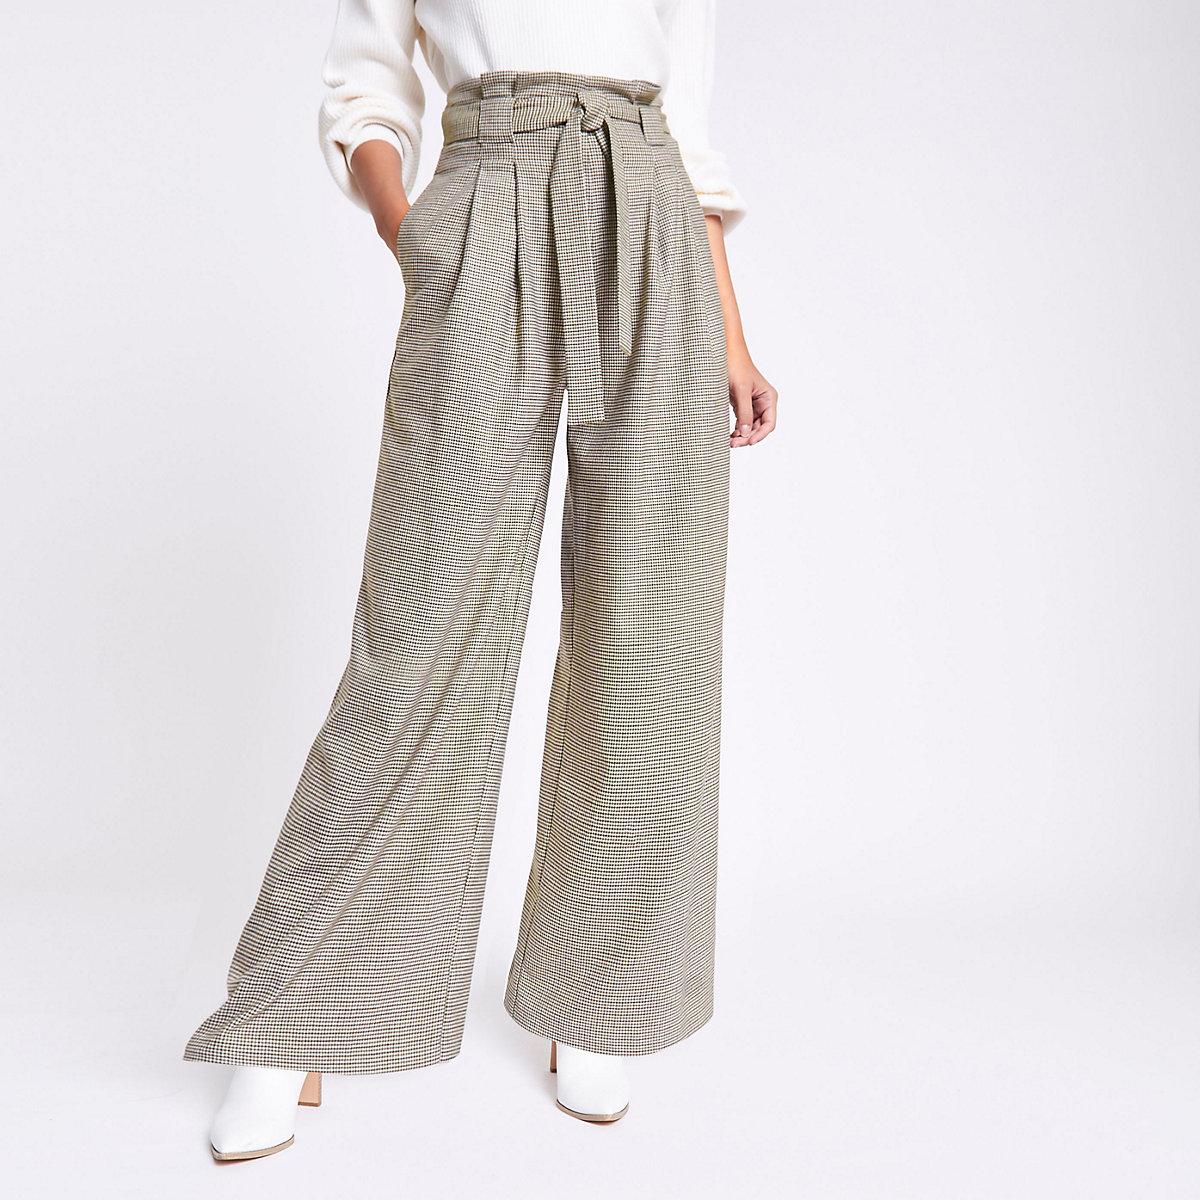 Khaki check wide leg belted pants